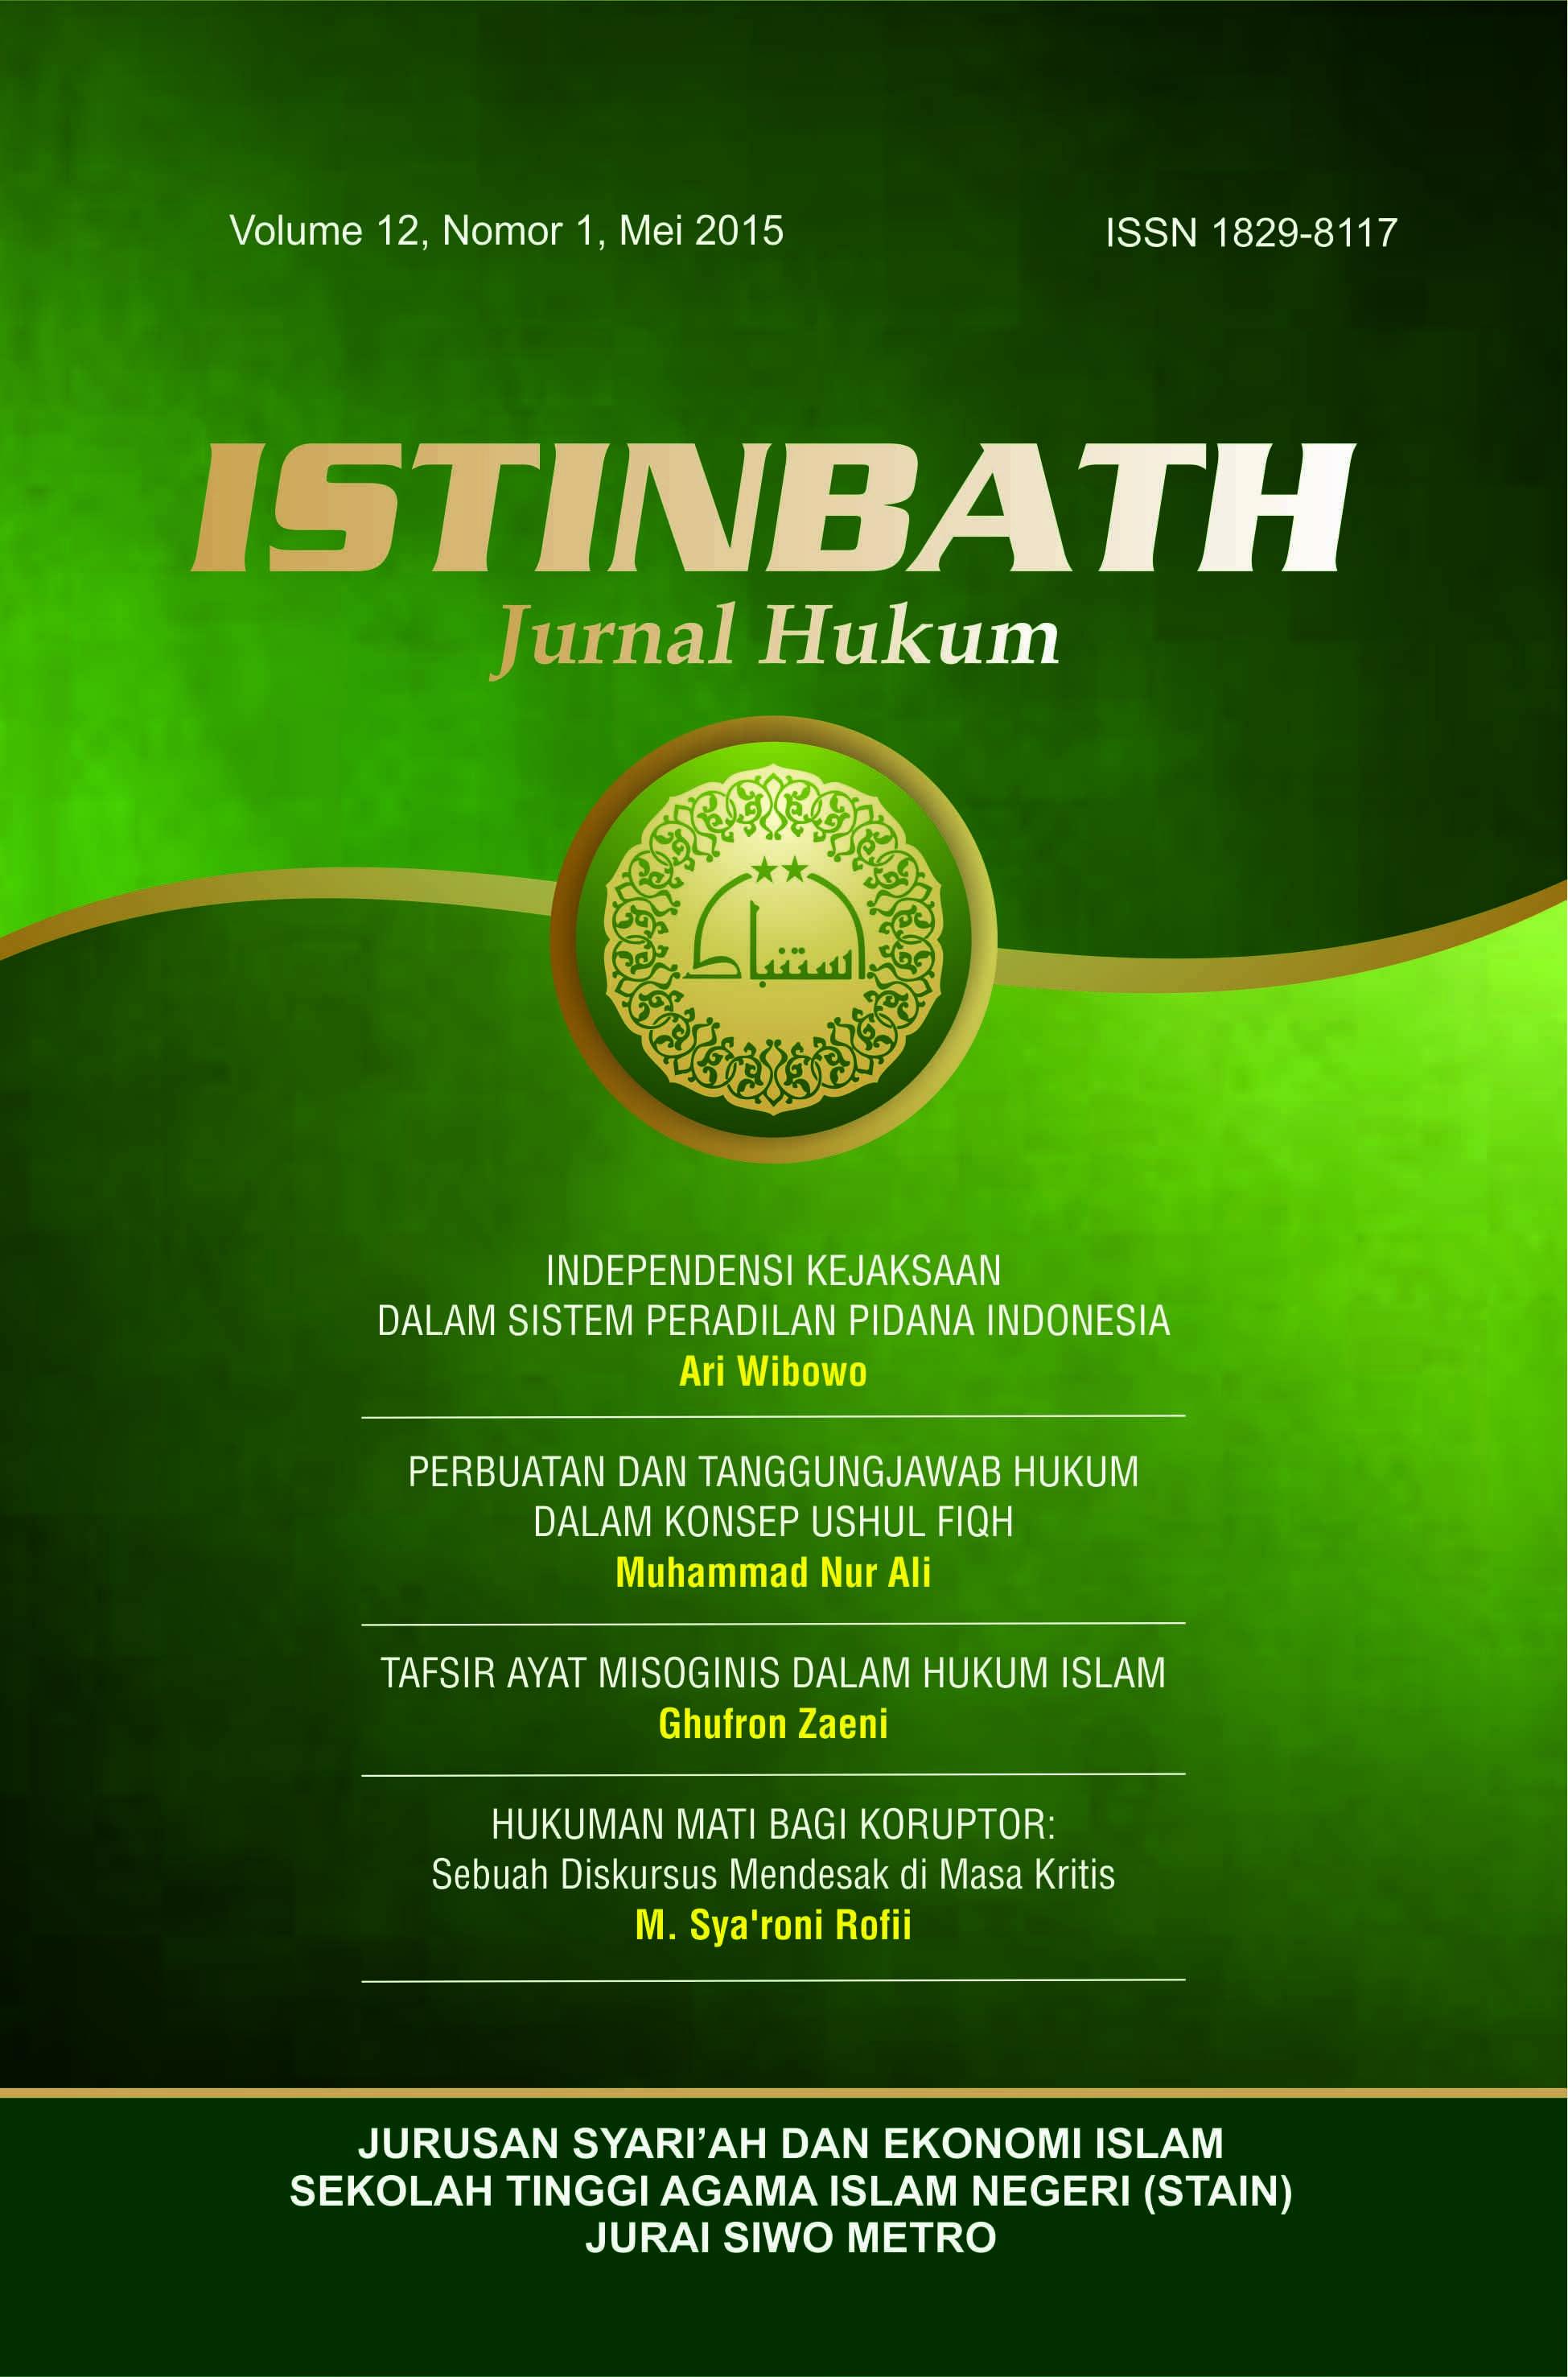 Kejahatan Anak Menurut Hukum Pidana Positif Dan Hukum Pidana Islam Istinbath Jurnal Hukum